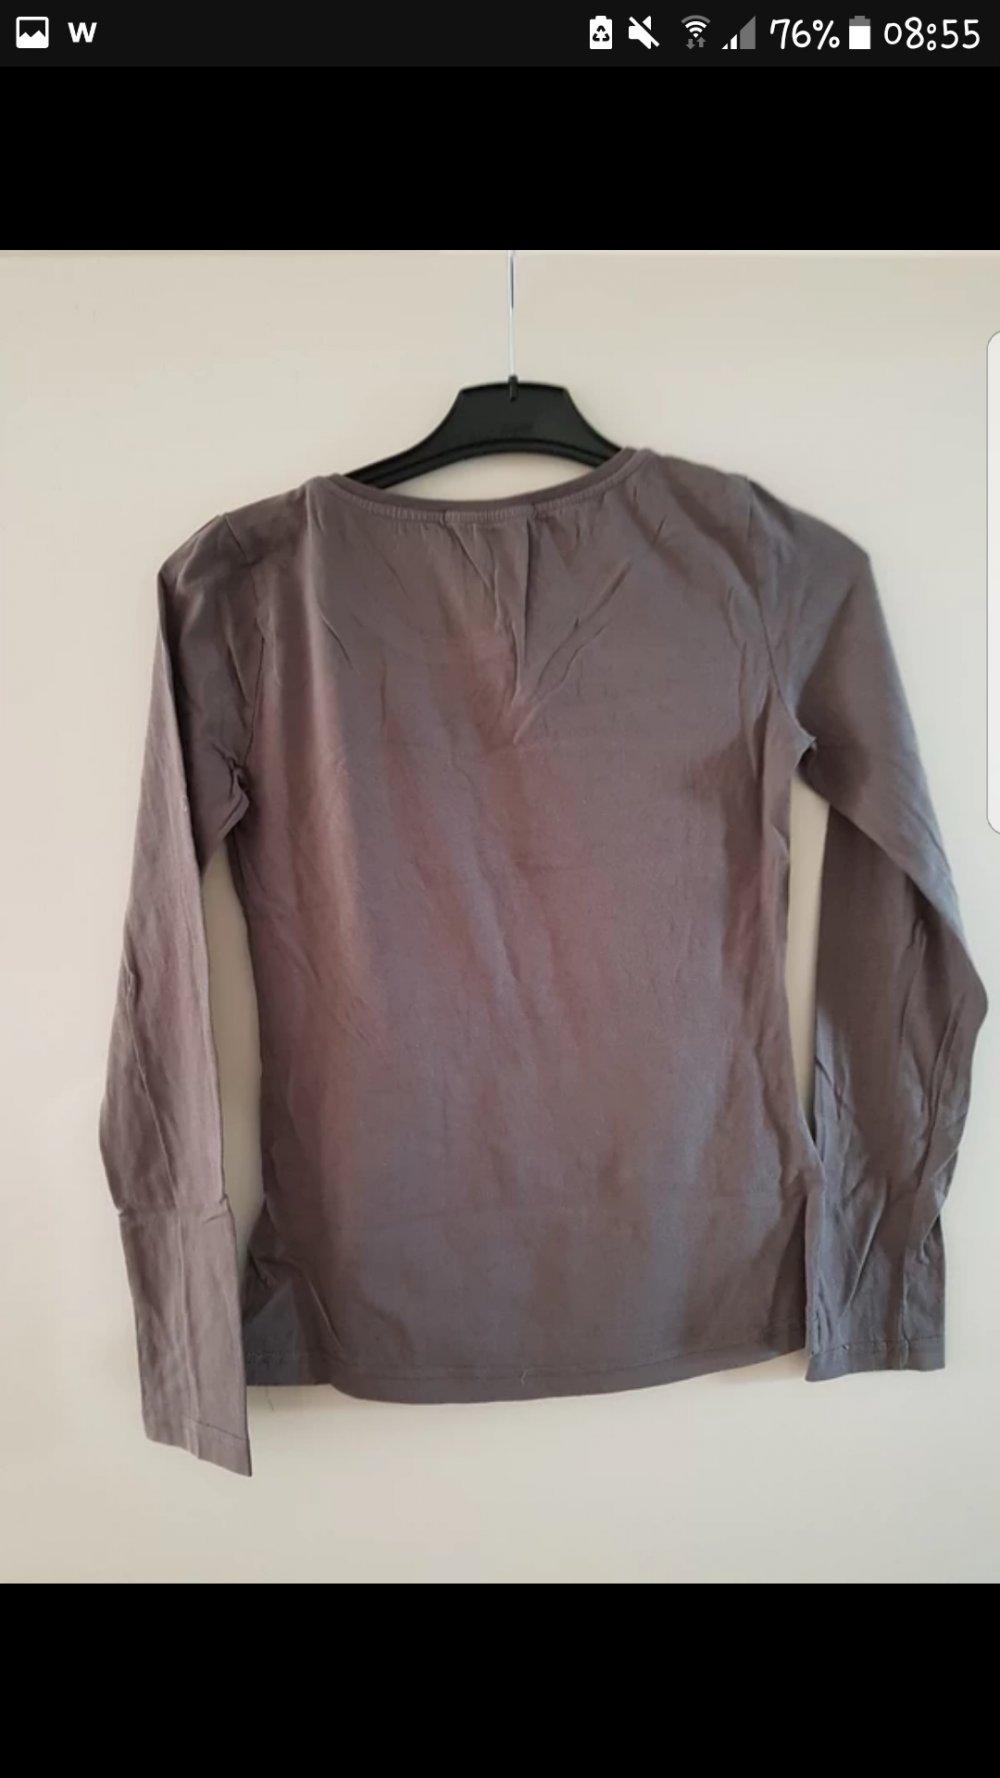 Größe Soul Stitch L La Shirt amp; xfvqTI0